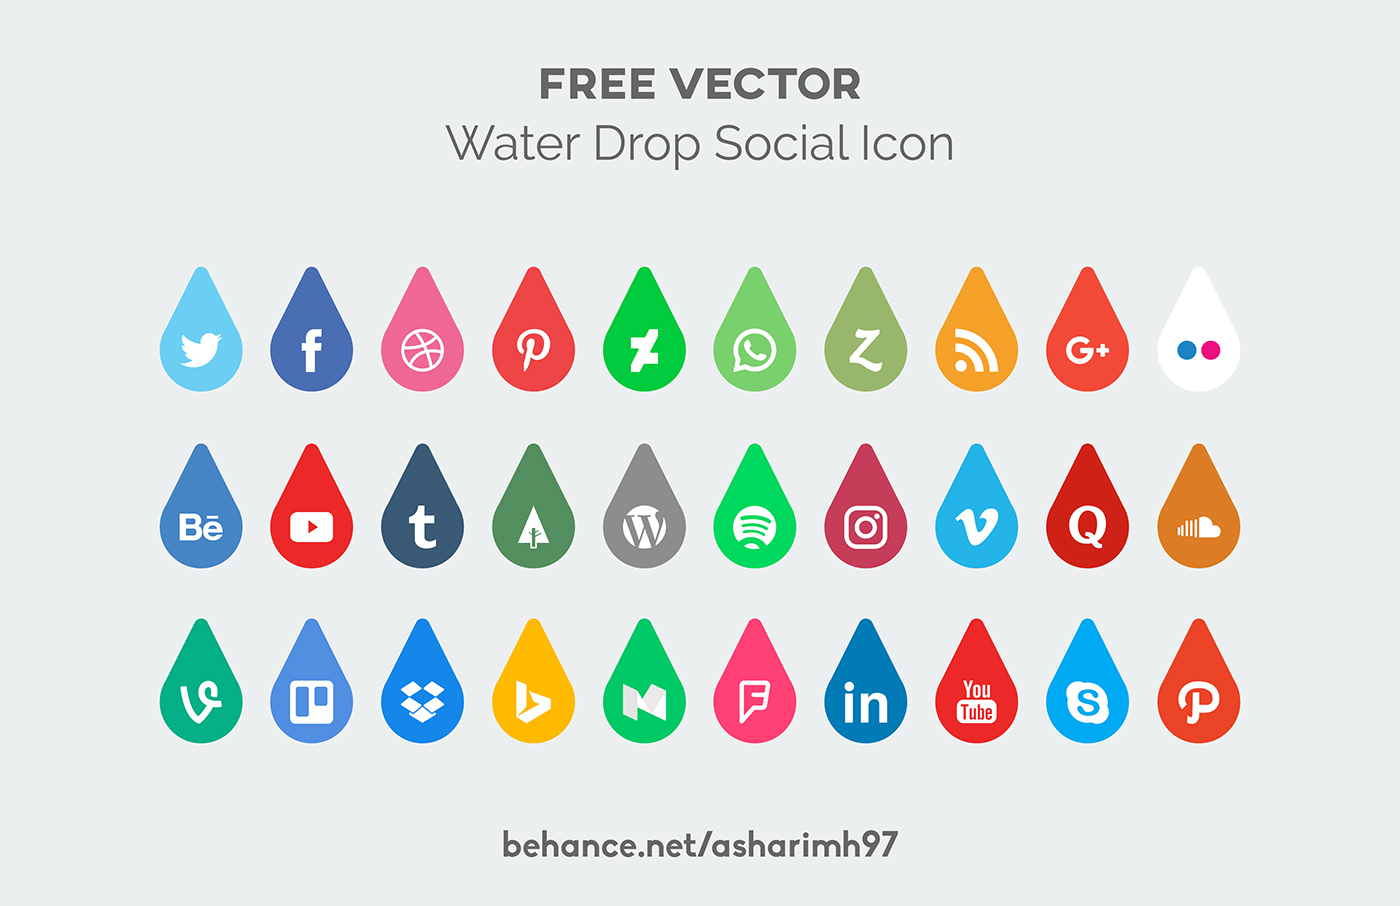 icon pack social media freebie hizbulloh design